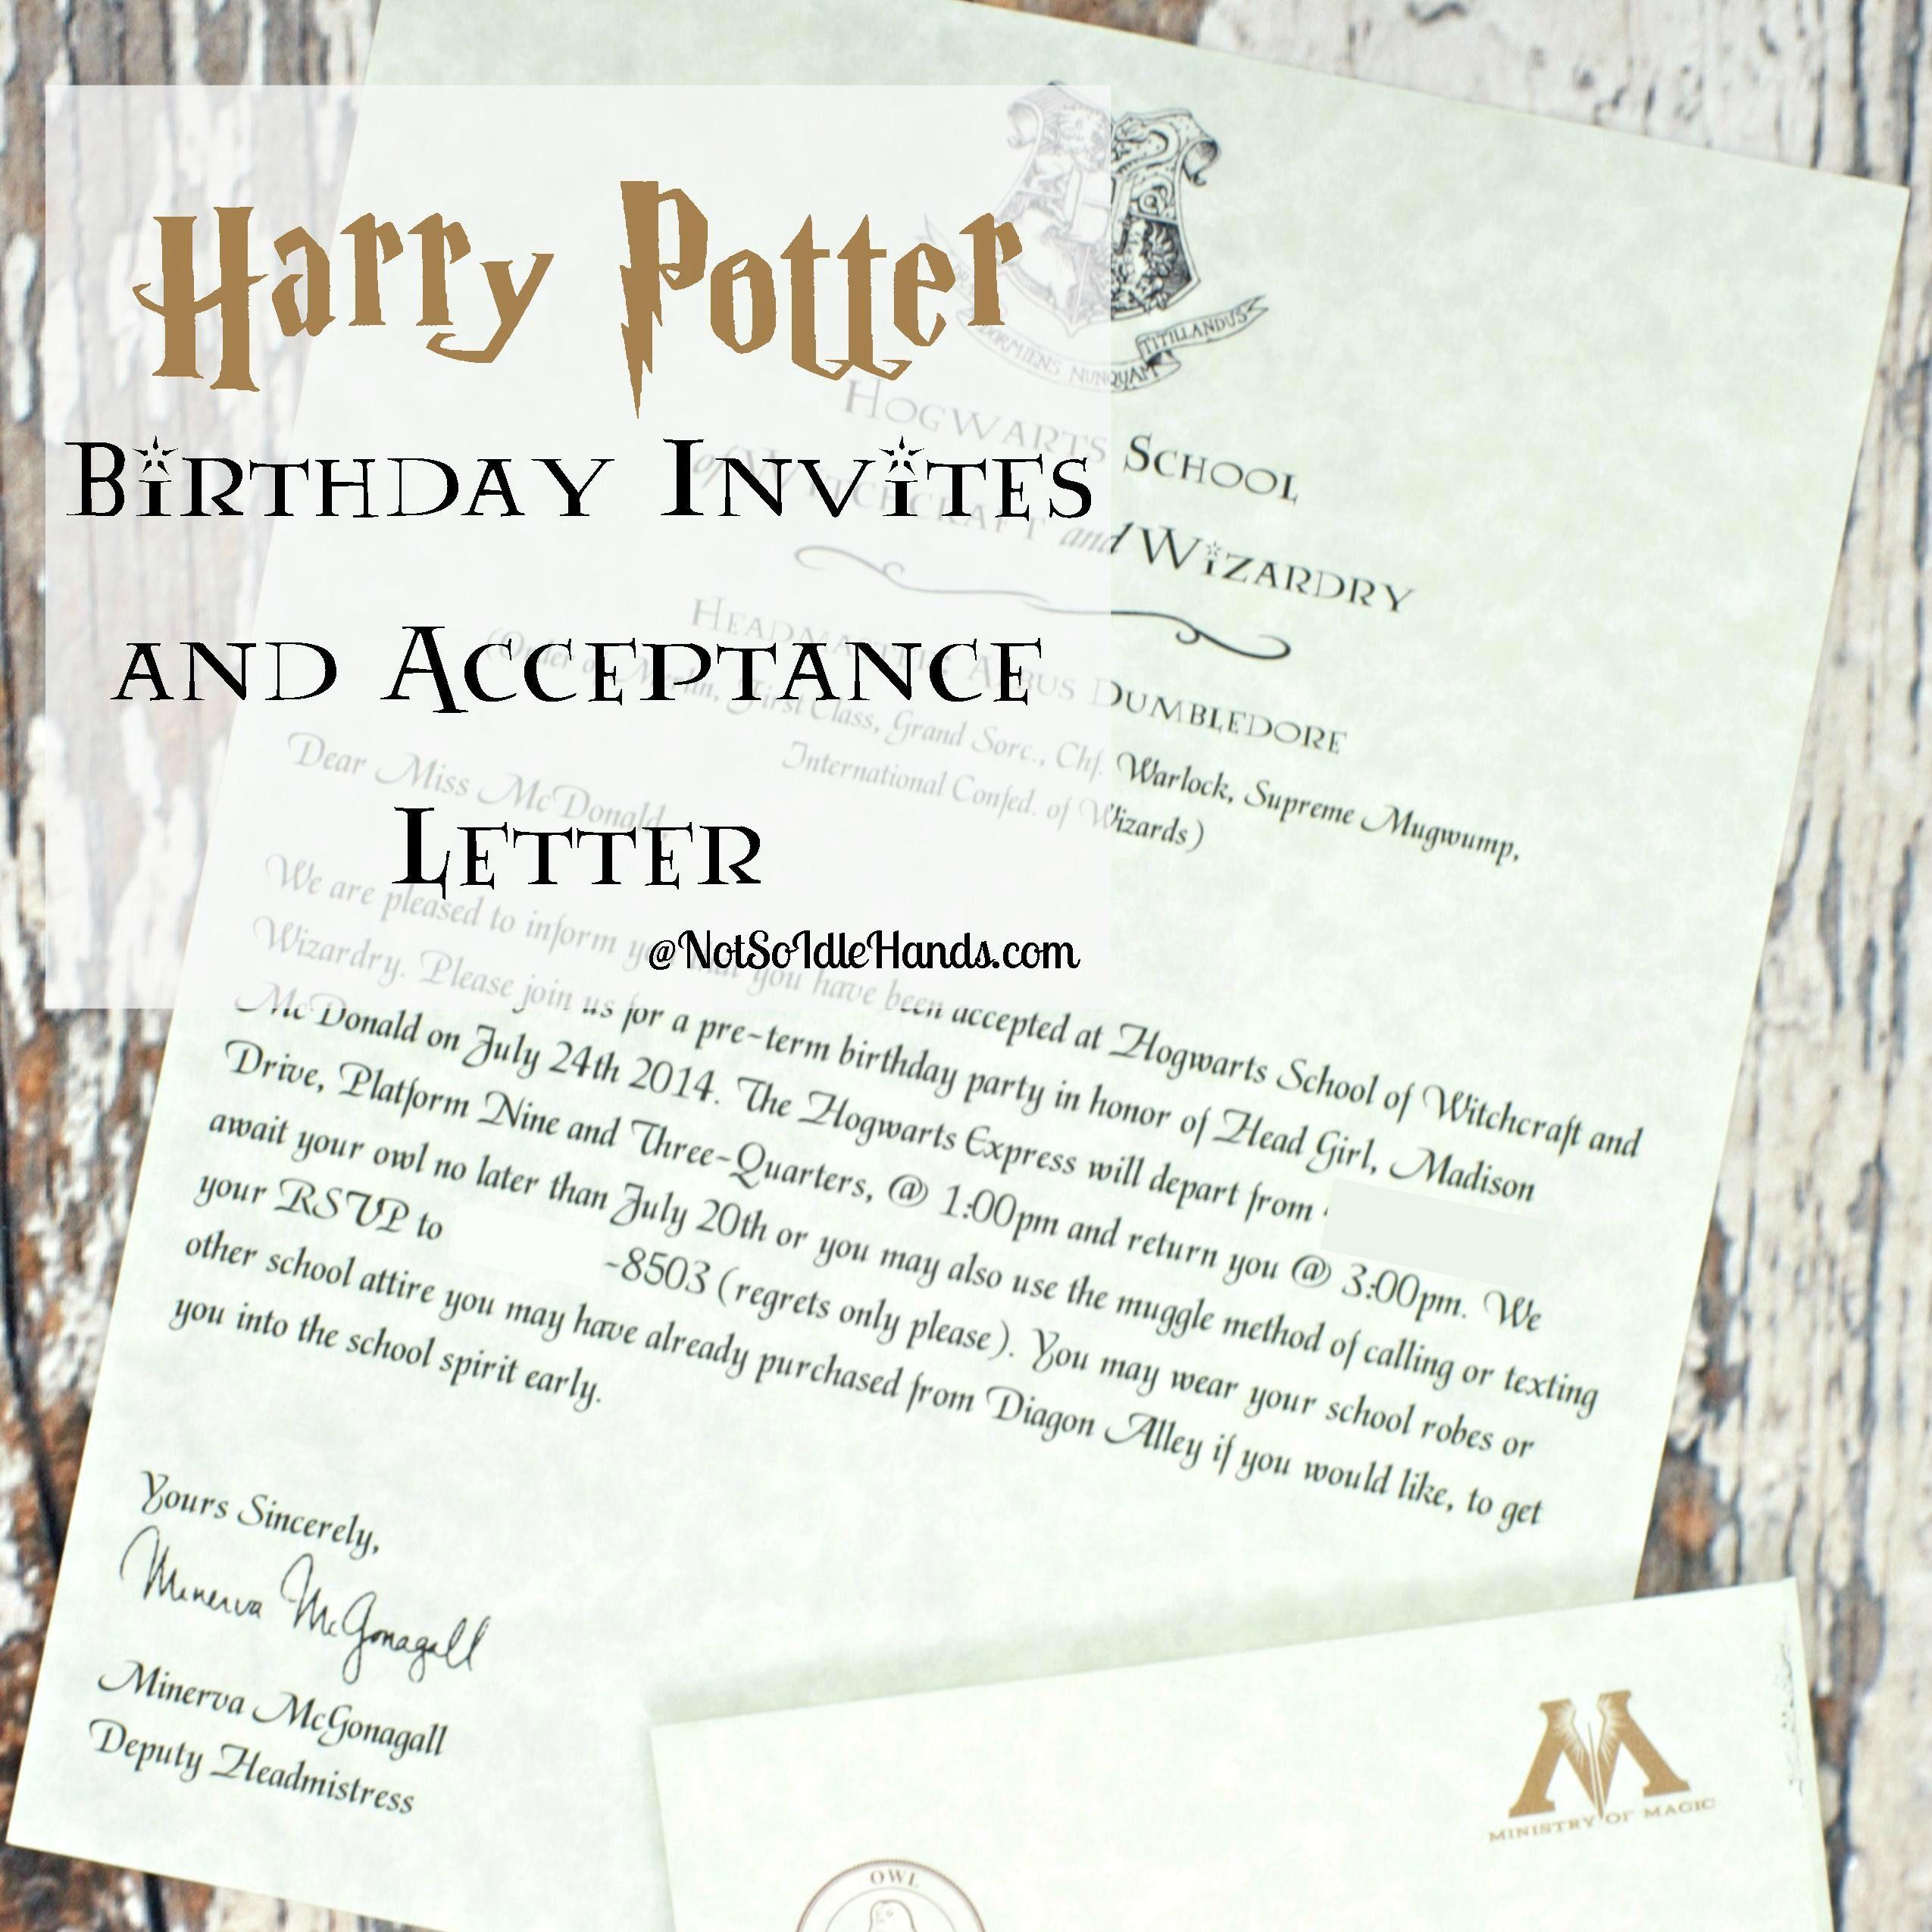 Harry potter birthday invitations and authentic acceptance letter harry potter birthday invitations and authentic acceptance letter and party part 1 notsoidlehands stopboris Images